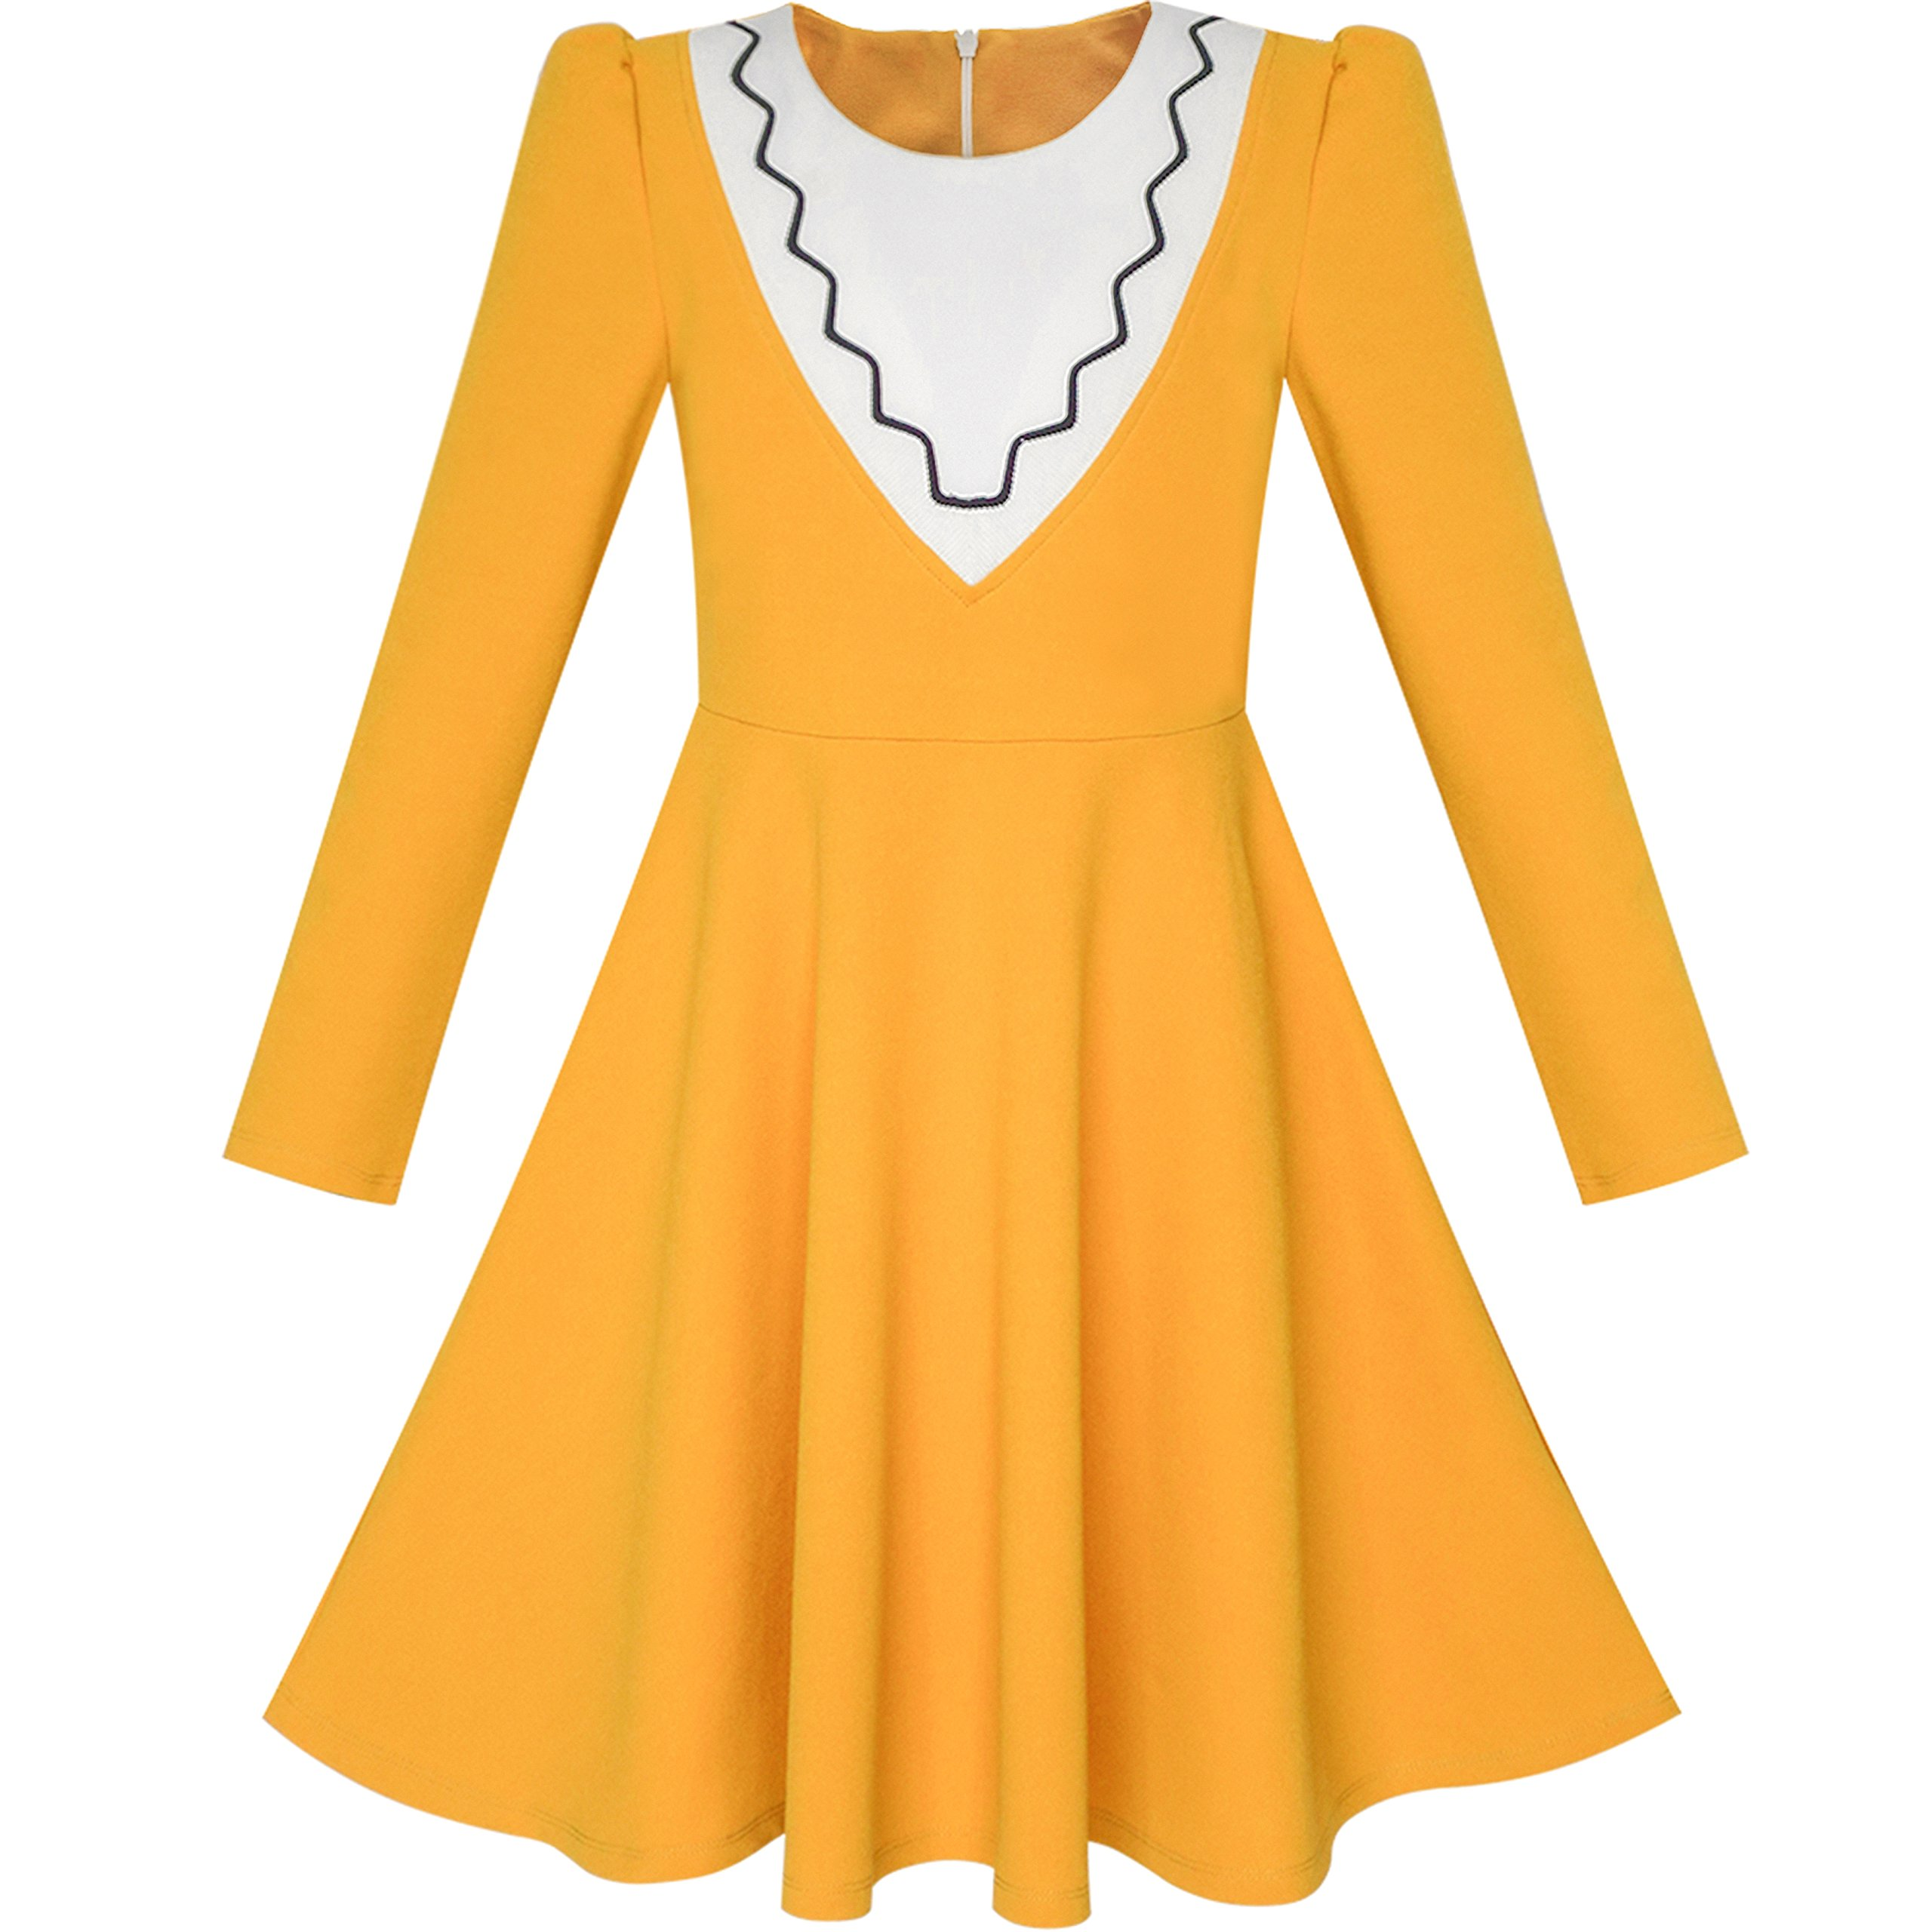 Sunny Fashion LH65 Girls Dress Back School Long Sleeve Yellow Dress Size 12